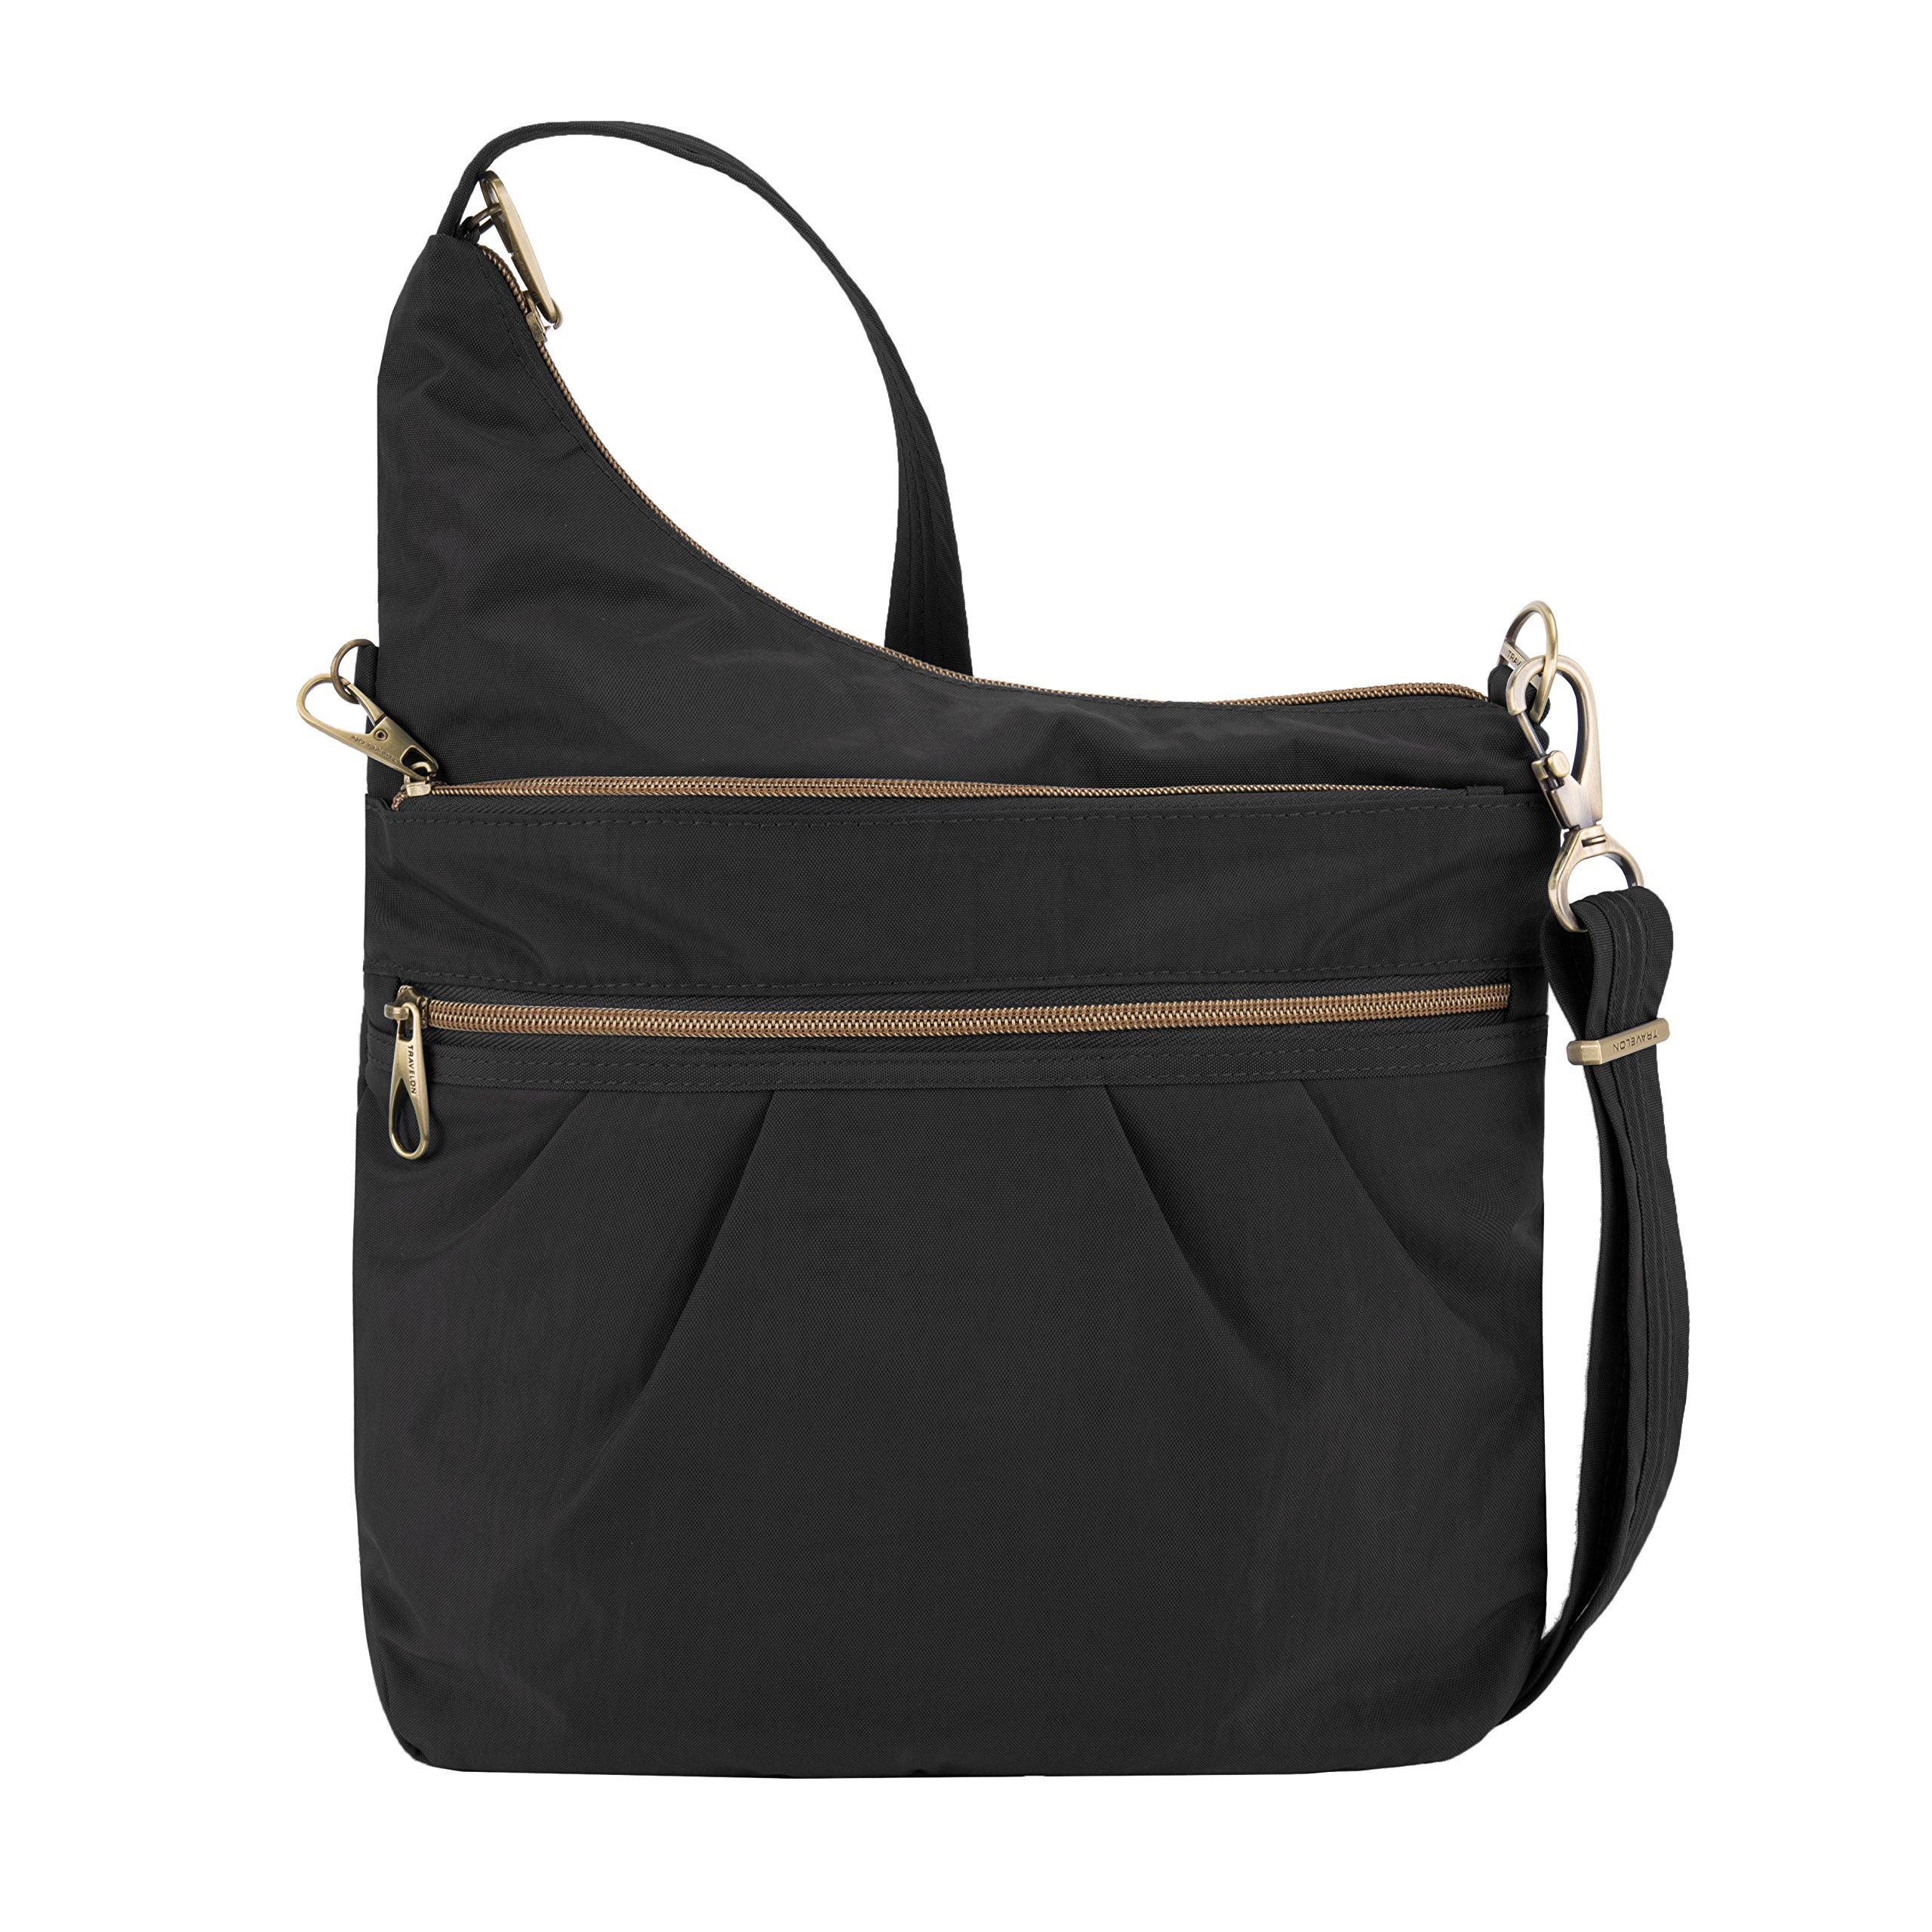 Travelon Anti-theft Signature 3 Compartment Cross Body Bag, Black